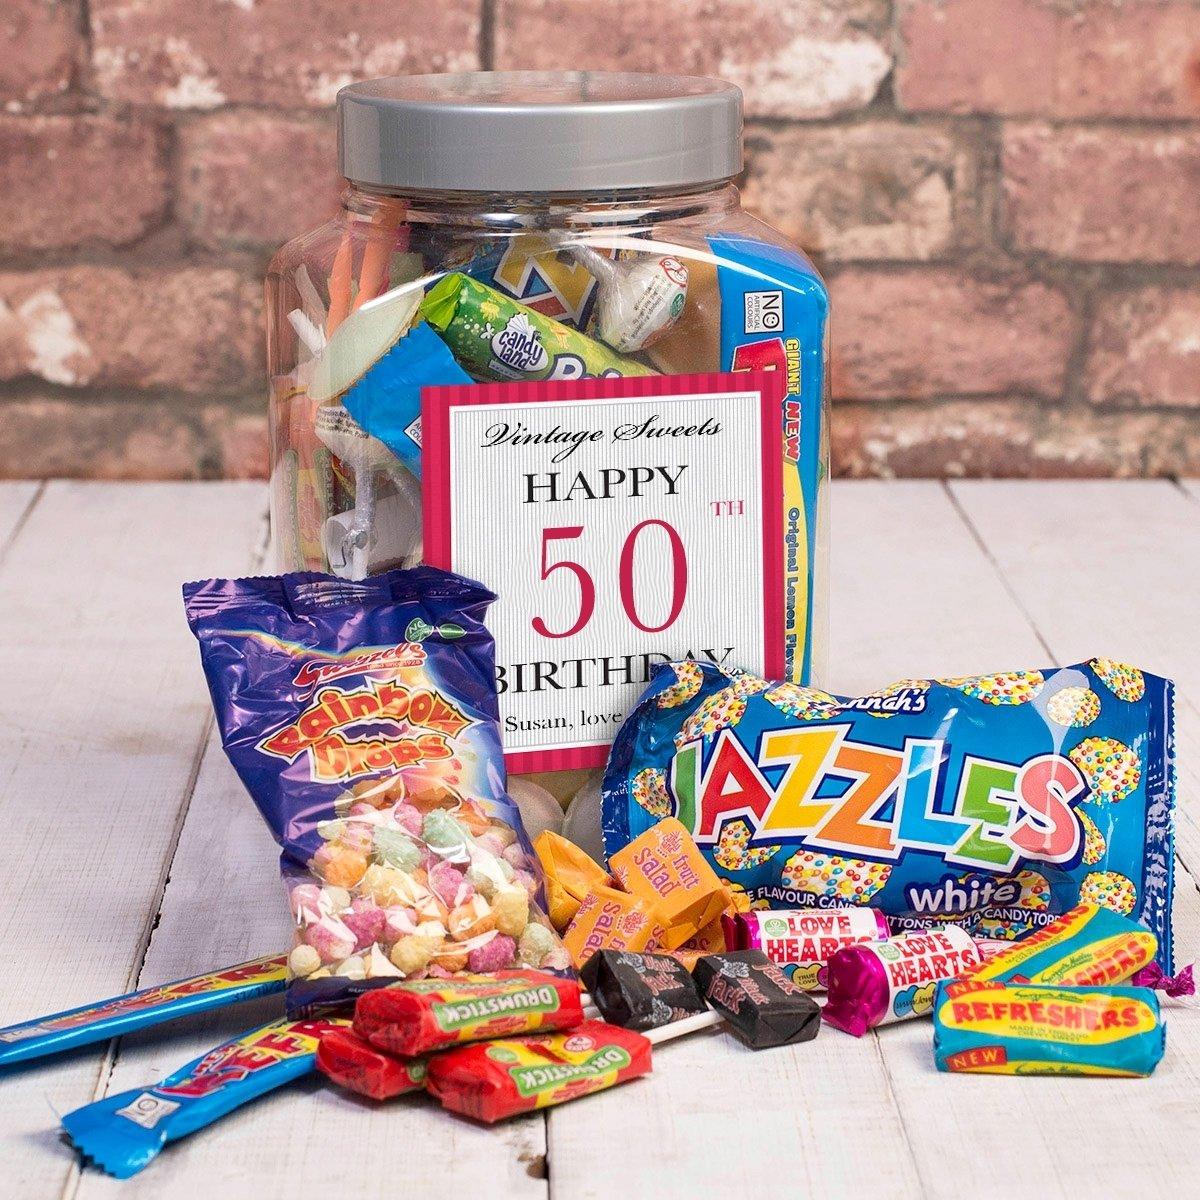 10 Fabulous 50Th Birthday Ideas For Wife personalised retro sweet jar happy 50th birthday gettingpersonal 1 2020